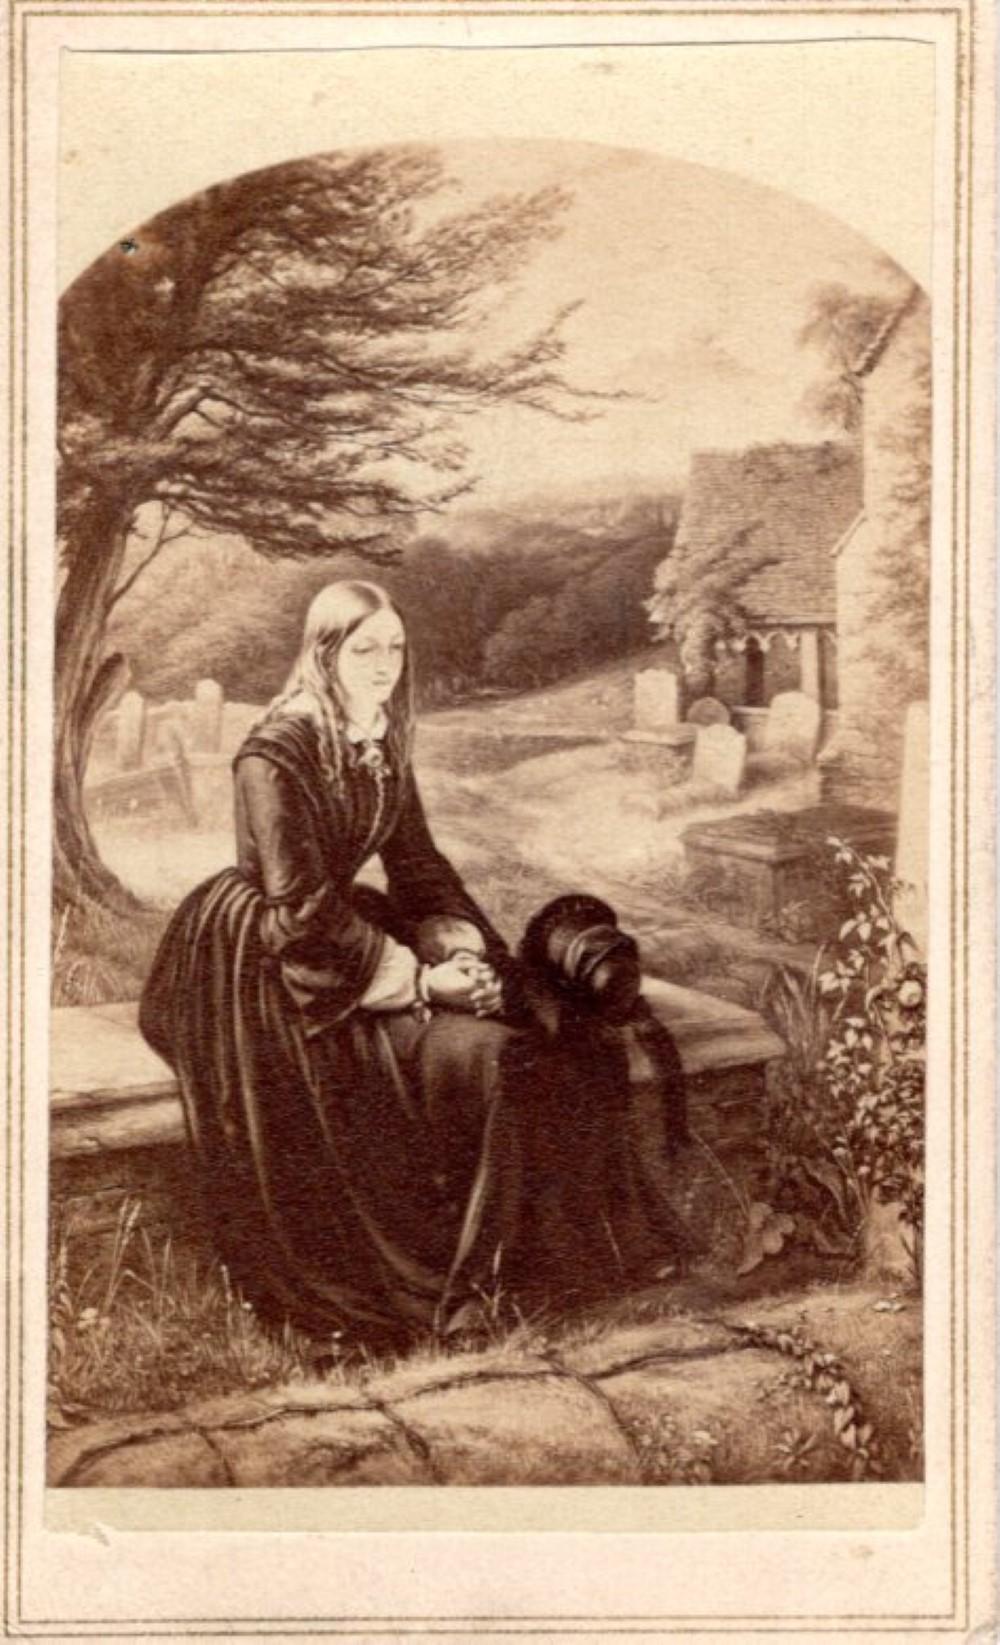 Sister's Grave, mourning CDV